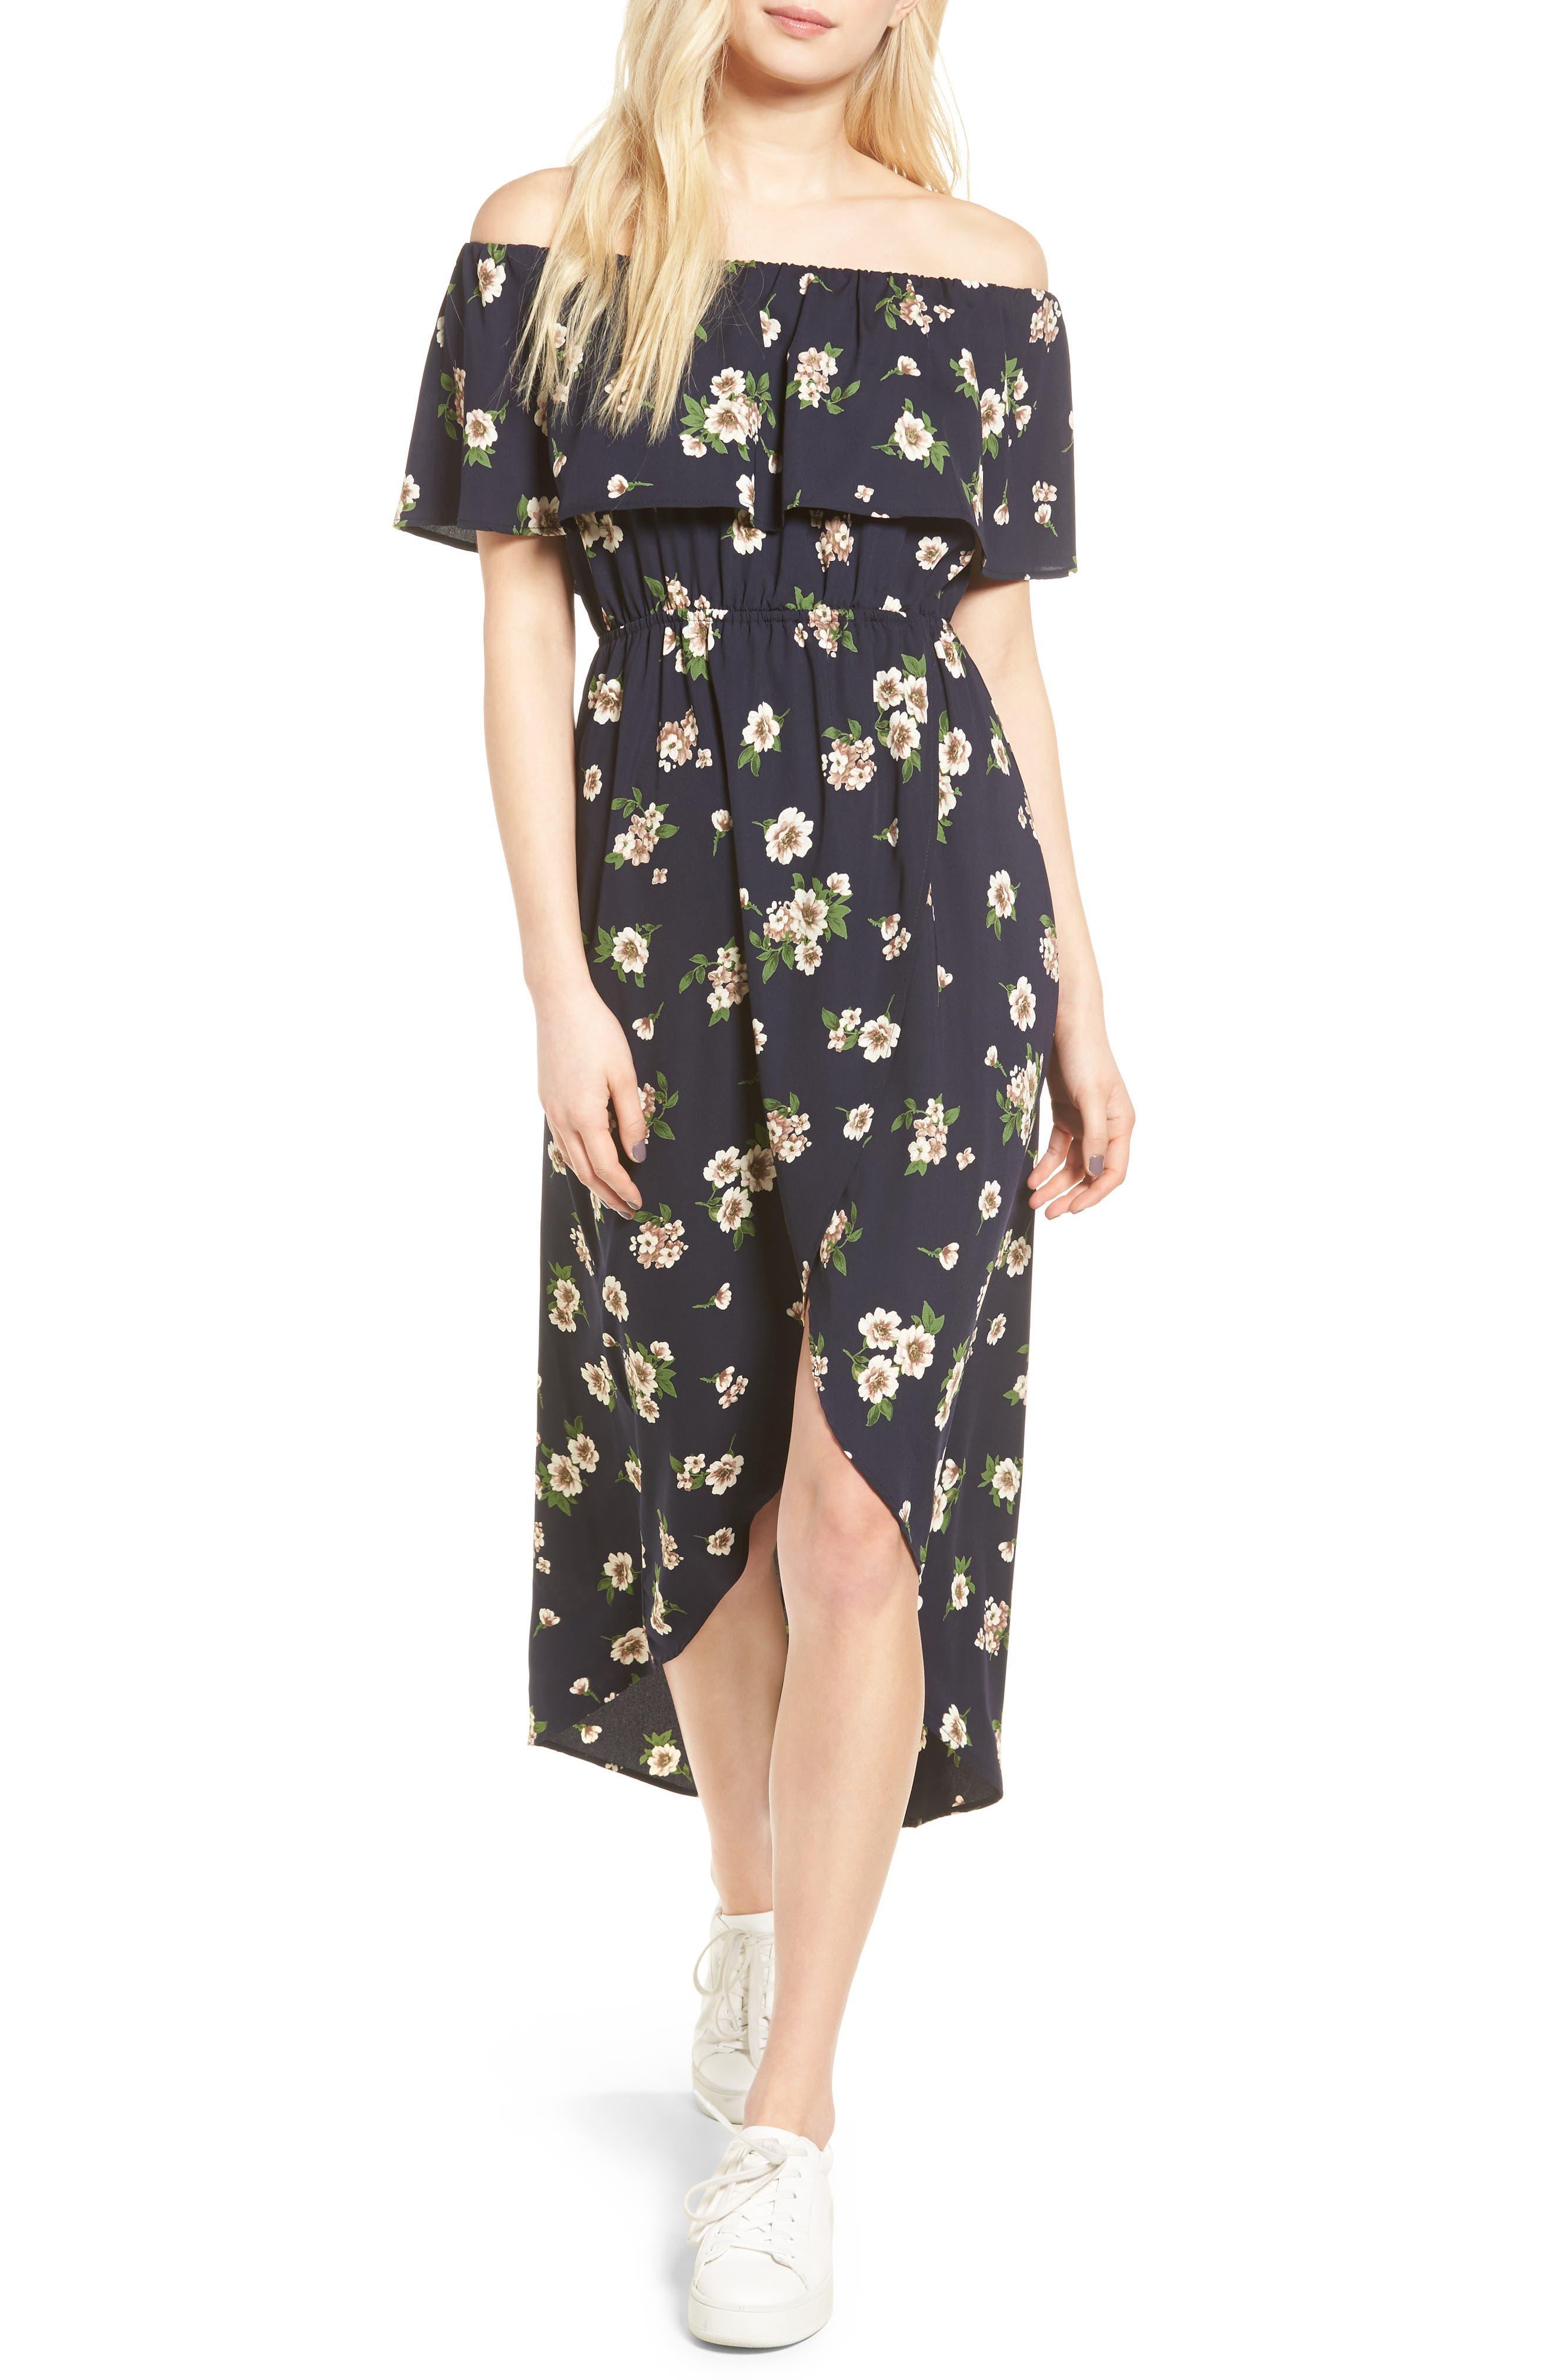 Main Image - Soprano Floral Print Off the Shoulder Dress